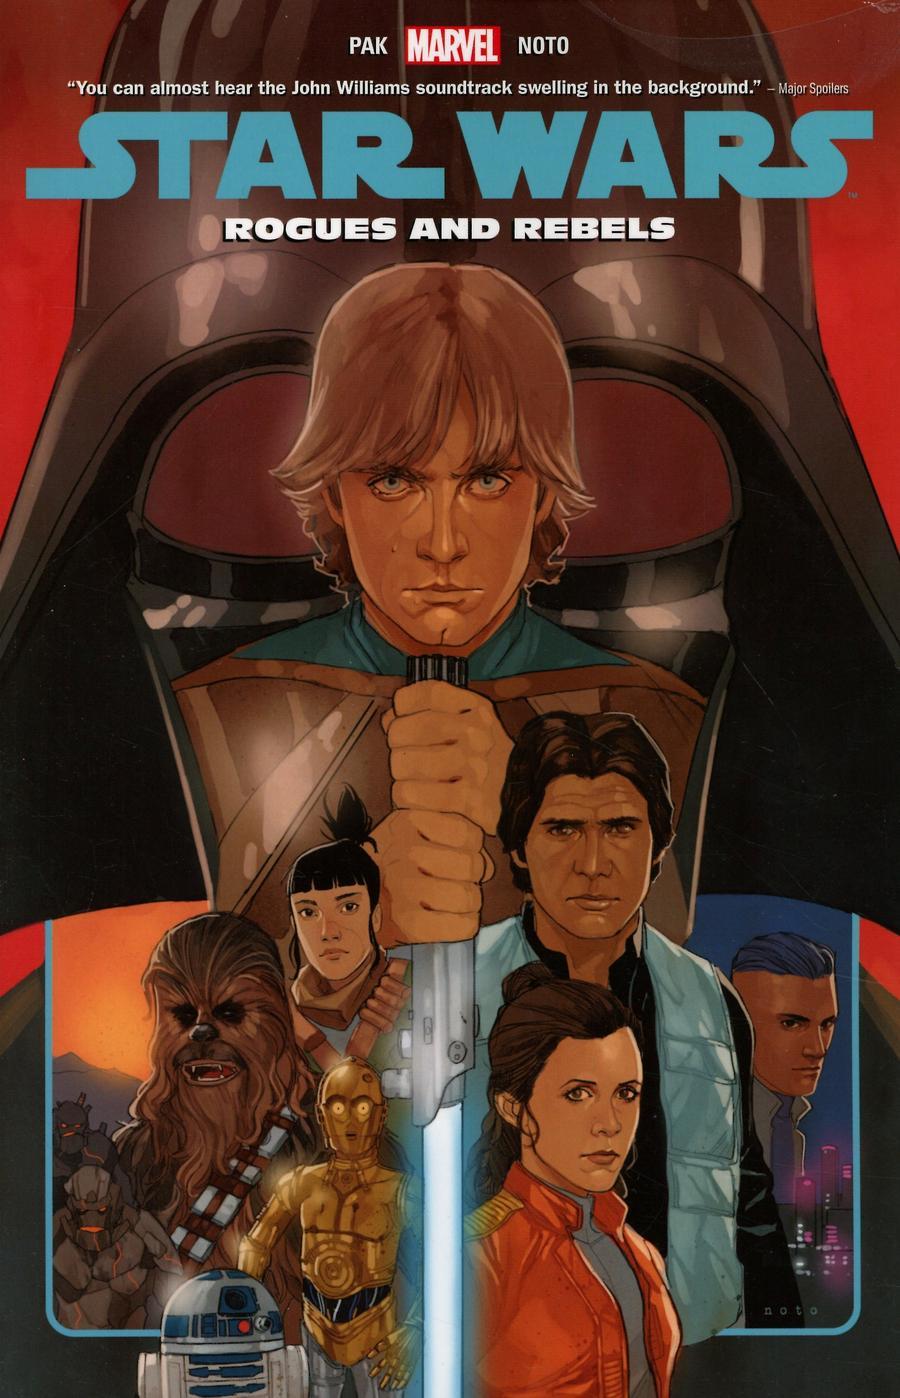 Star Wars (Marvel) Vol 13 Rogues And Rebels TP